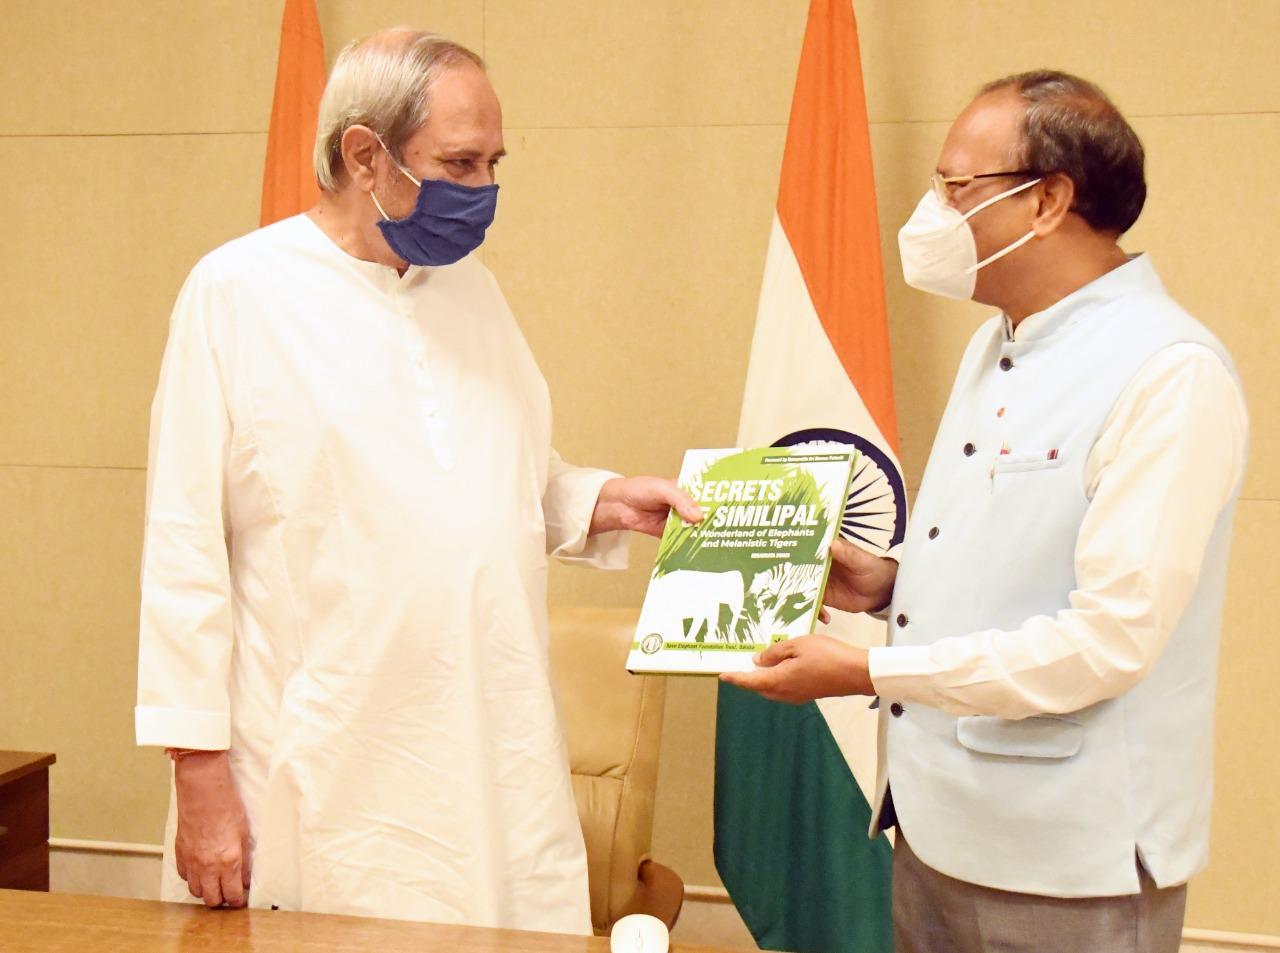 Lokayukta Member Dr. Swain Presents His Book 'Secrets of Similipal' to Chief Minister